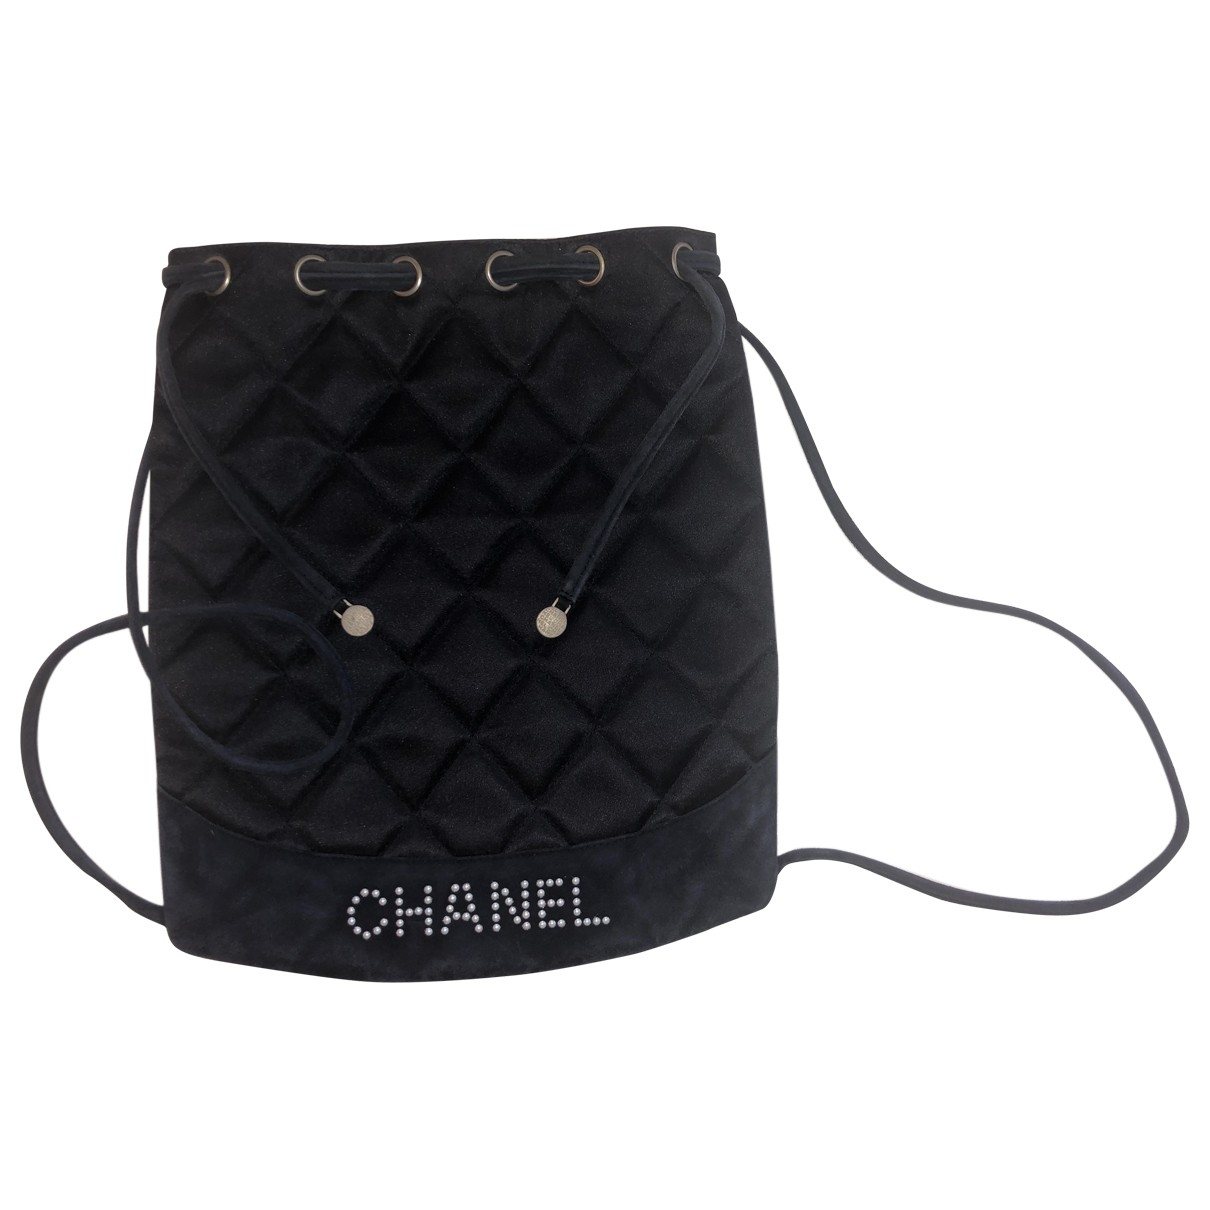 Chanel \N Rucksaecke in  Schwarz Veloursleder